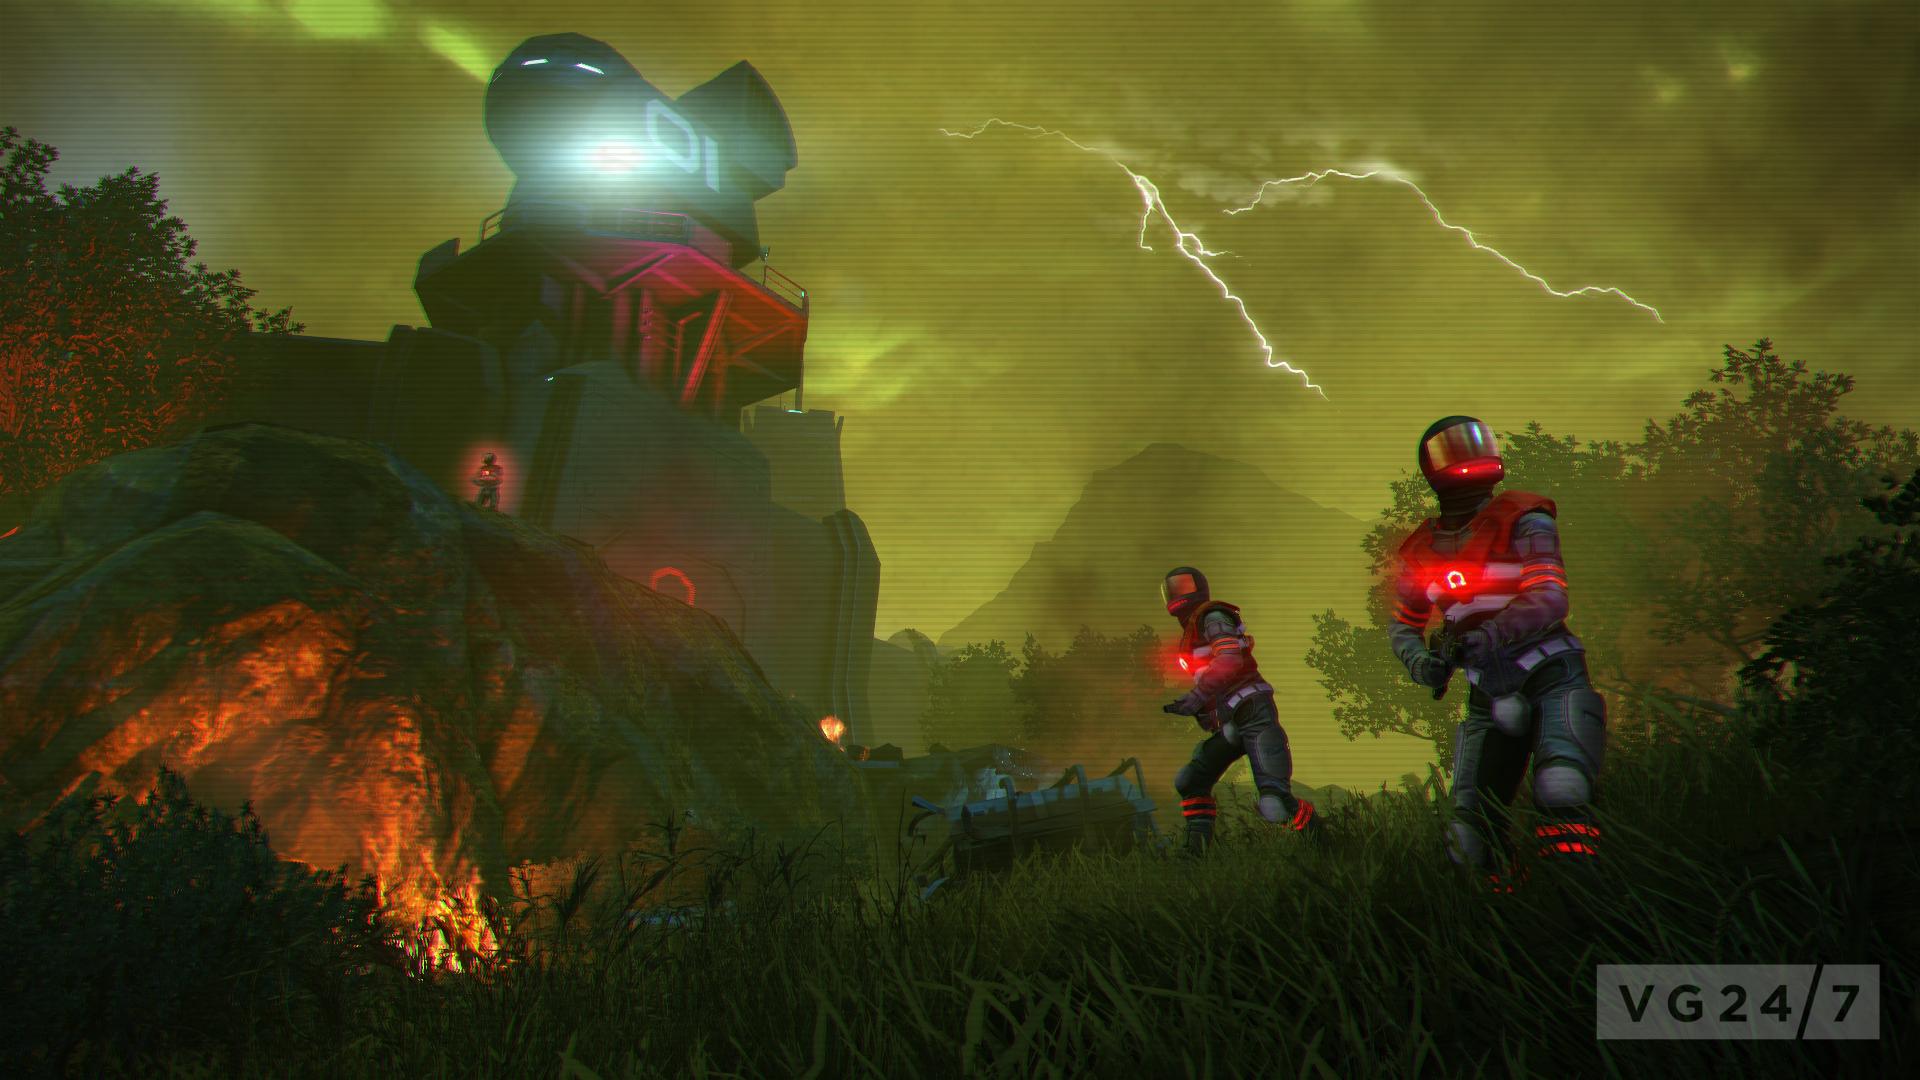 Far Cry 3 Blood Dragon S Creative Director Walks You Through This Gameplay Video Vg247